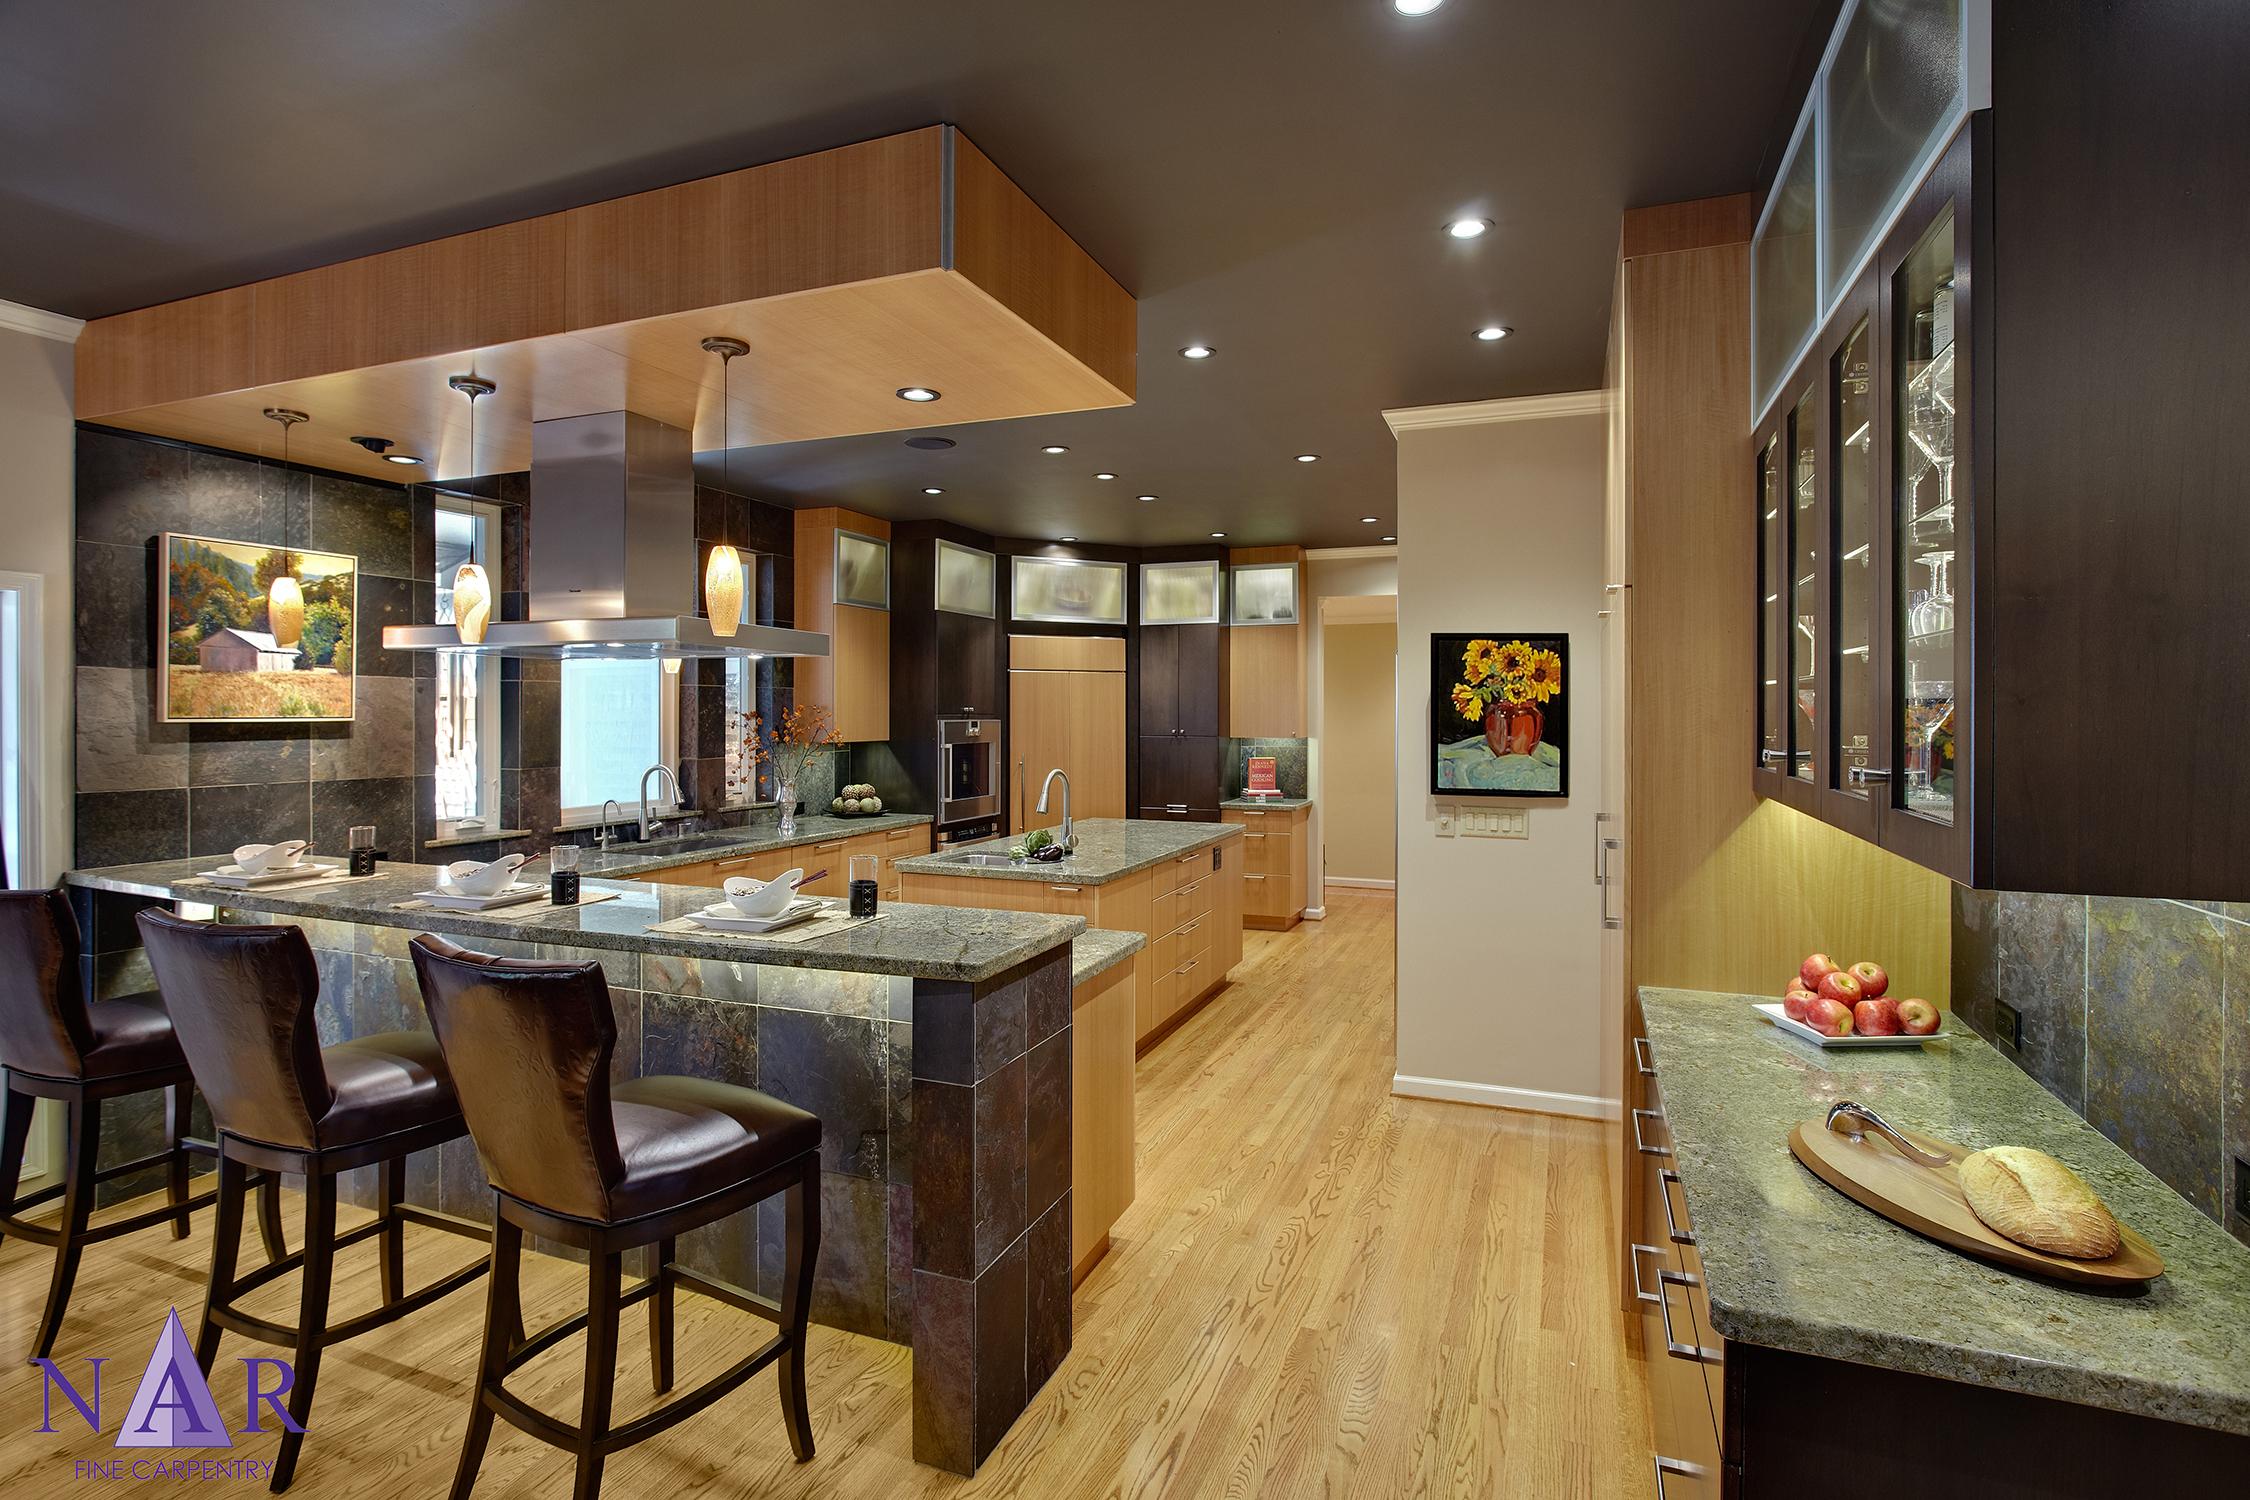 Davis Bistro Kitchen. Nar Fine Carpentry. Sacramento. El Dorado Hills